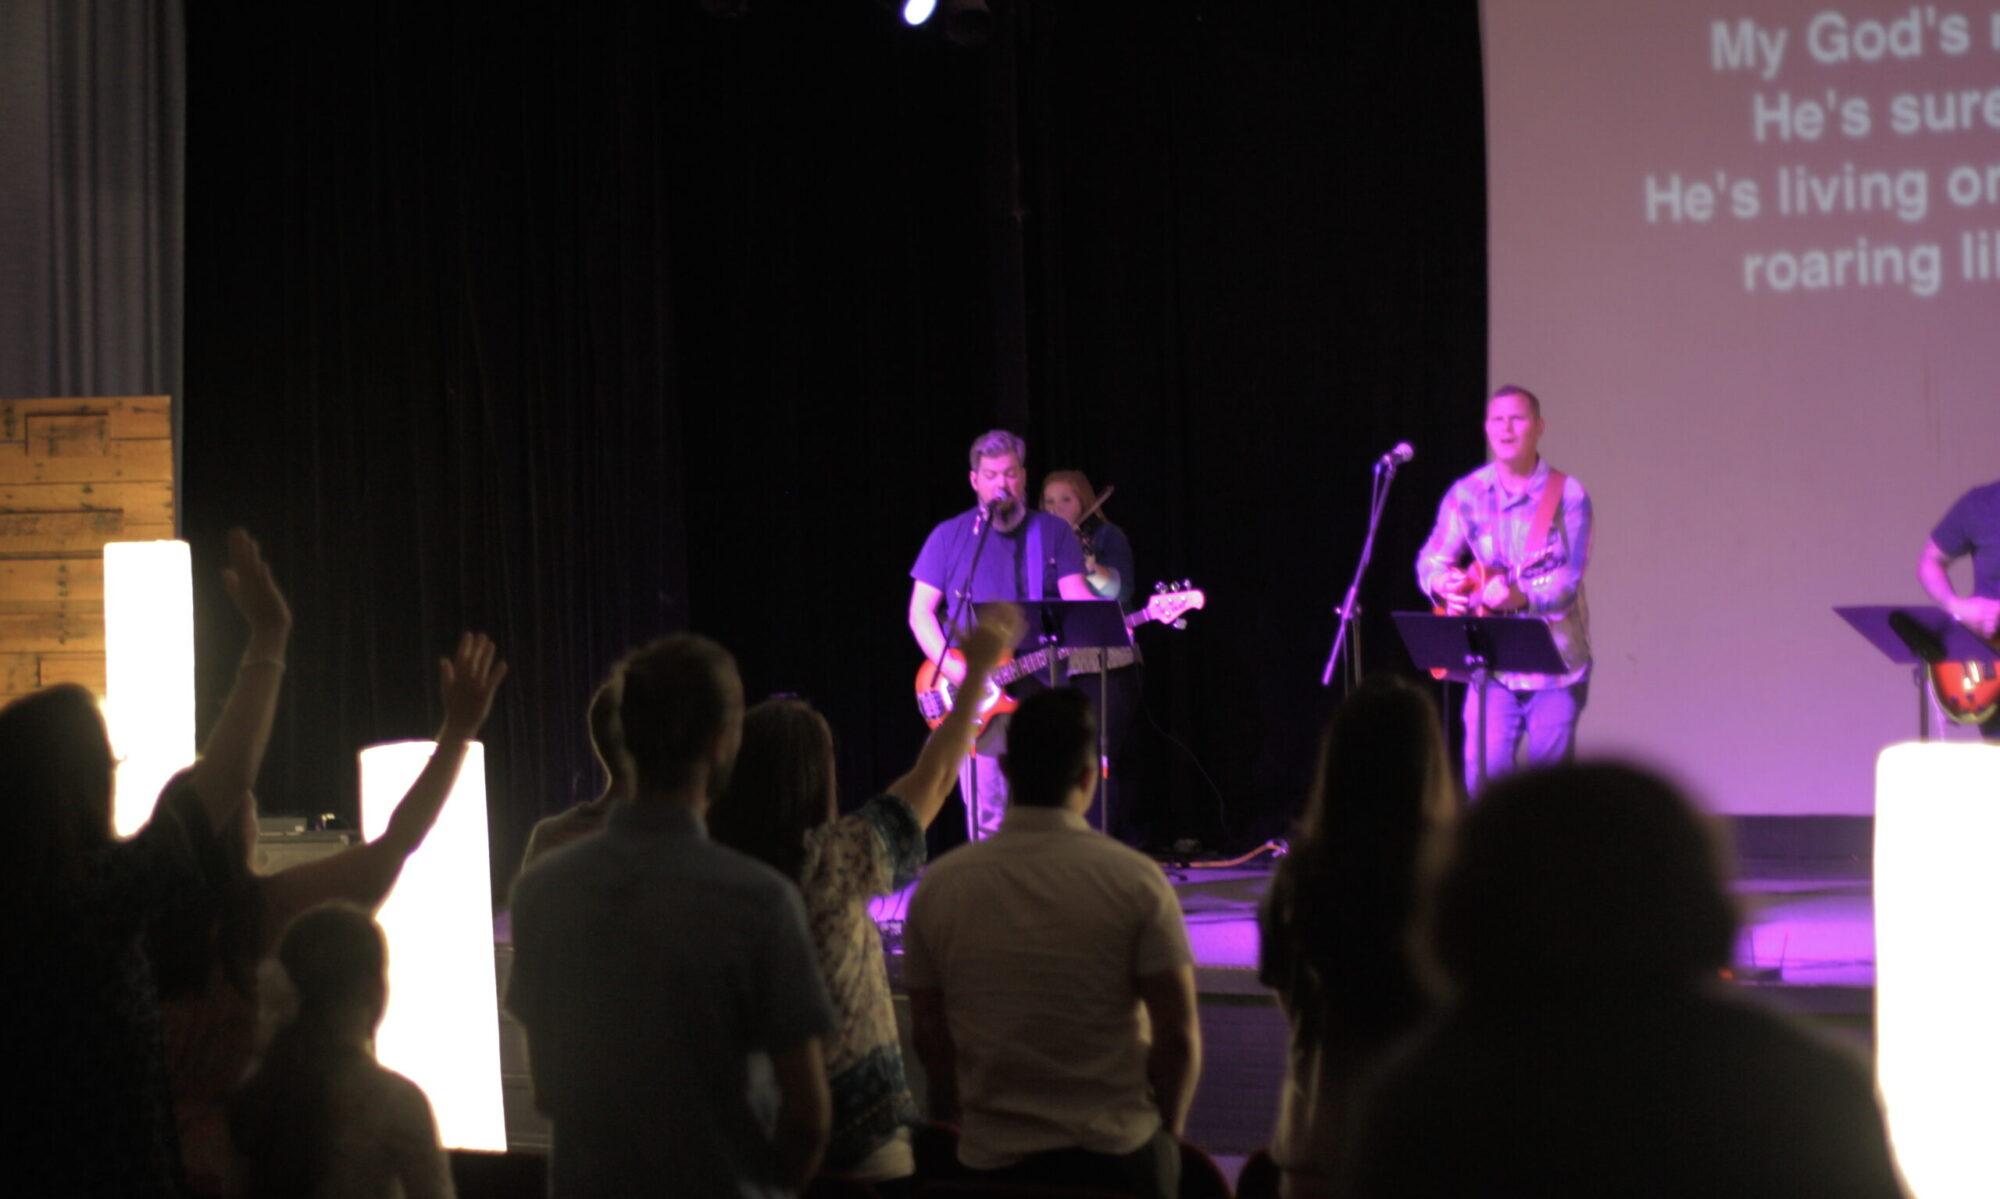 Gospel community church